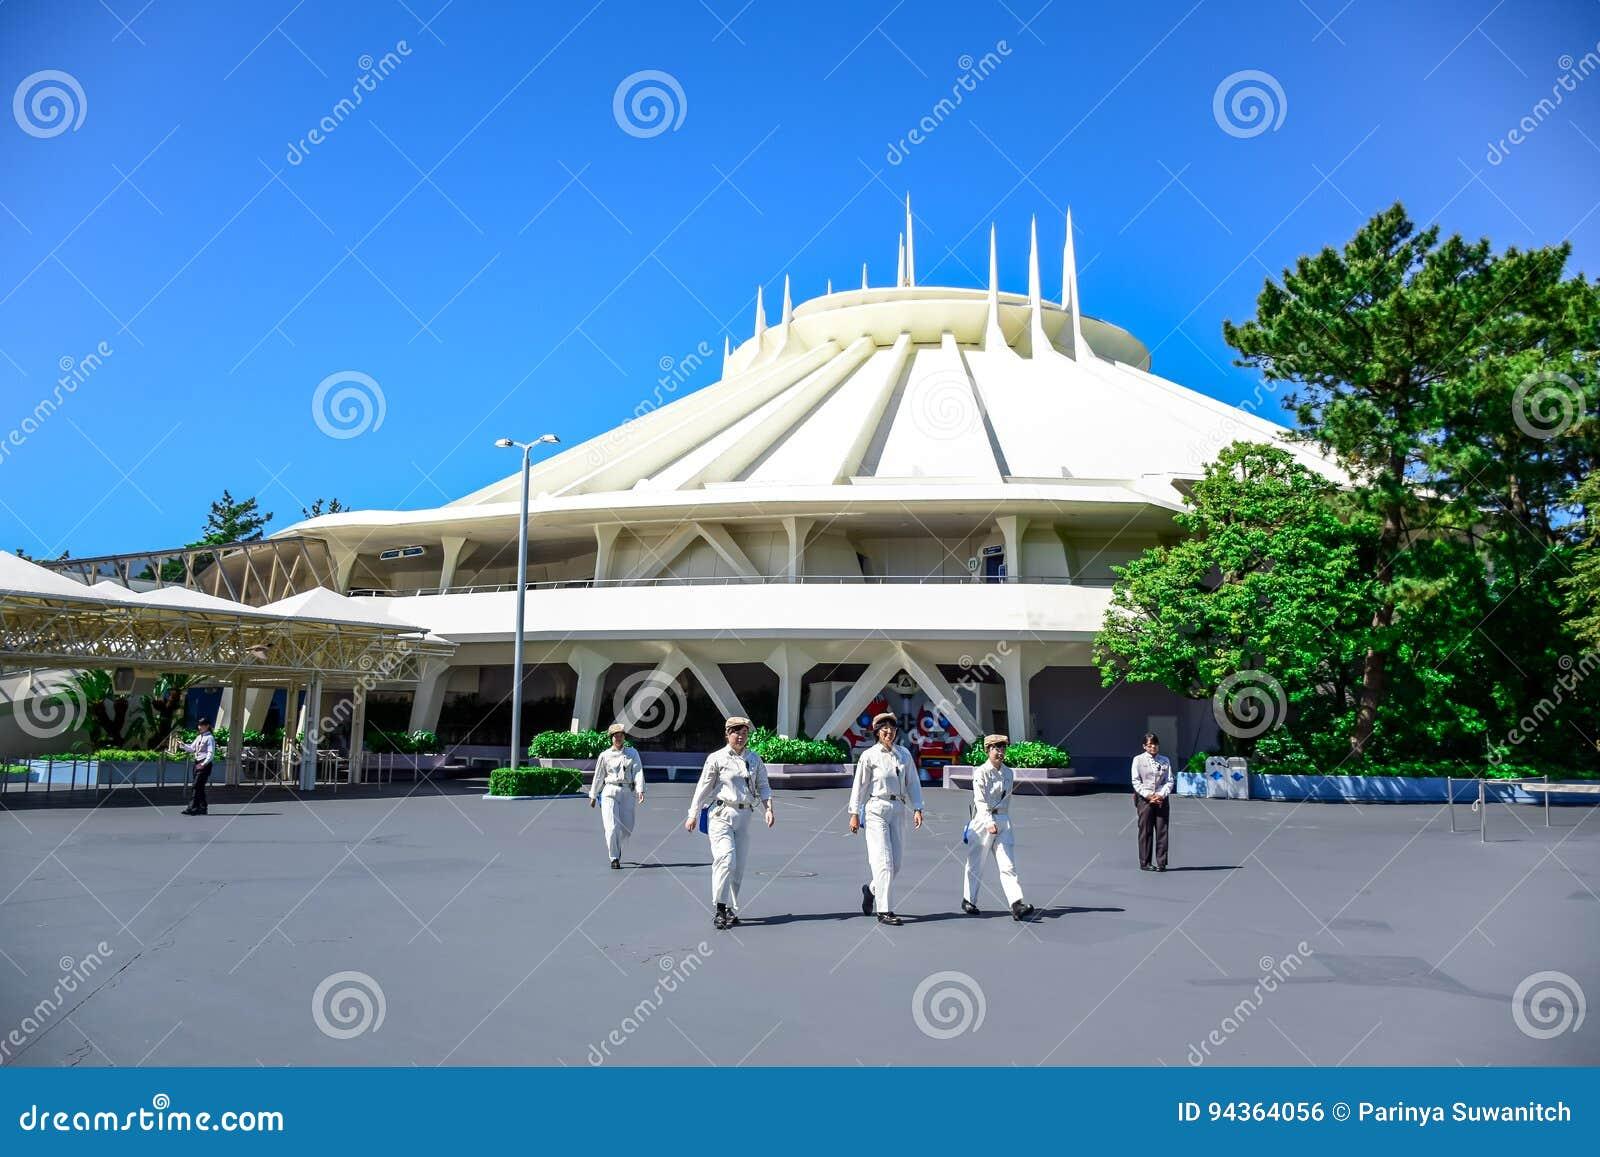 CHIBA, JAPAN: Ruimtebergaantrekkelijkheid in Tomorrowland in Tokyo Disneyland